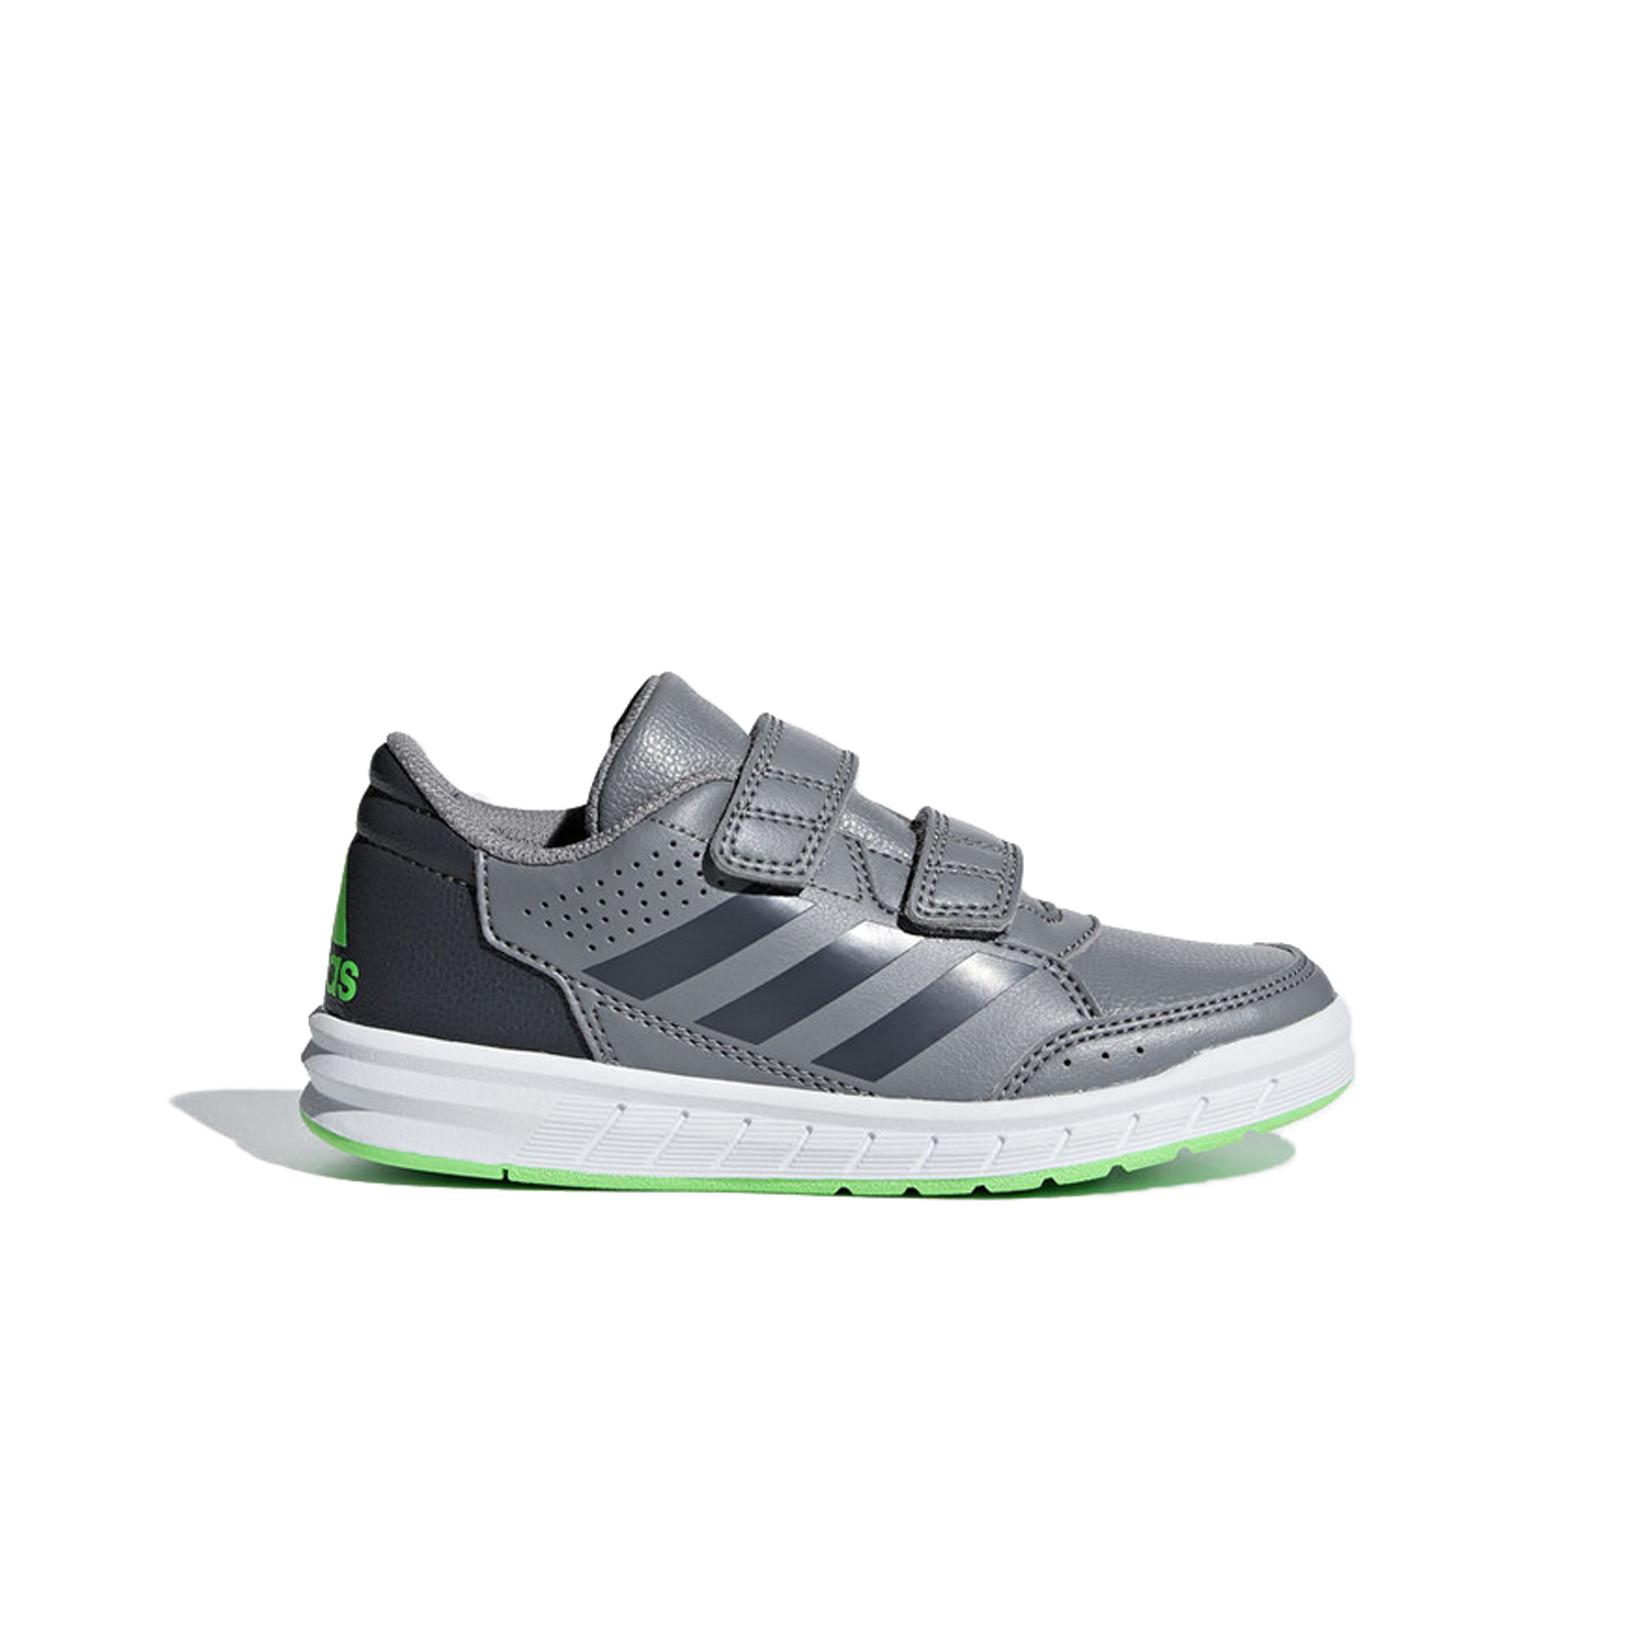 Adidas Altasport K Grey - Lime